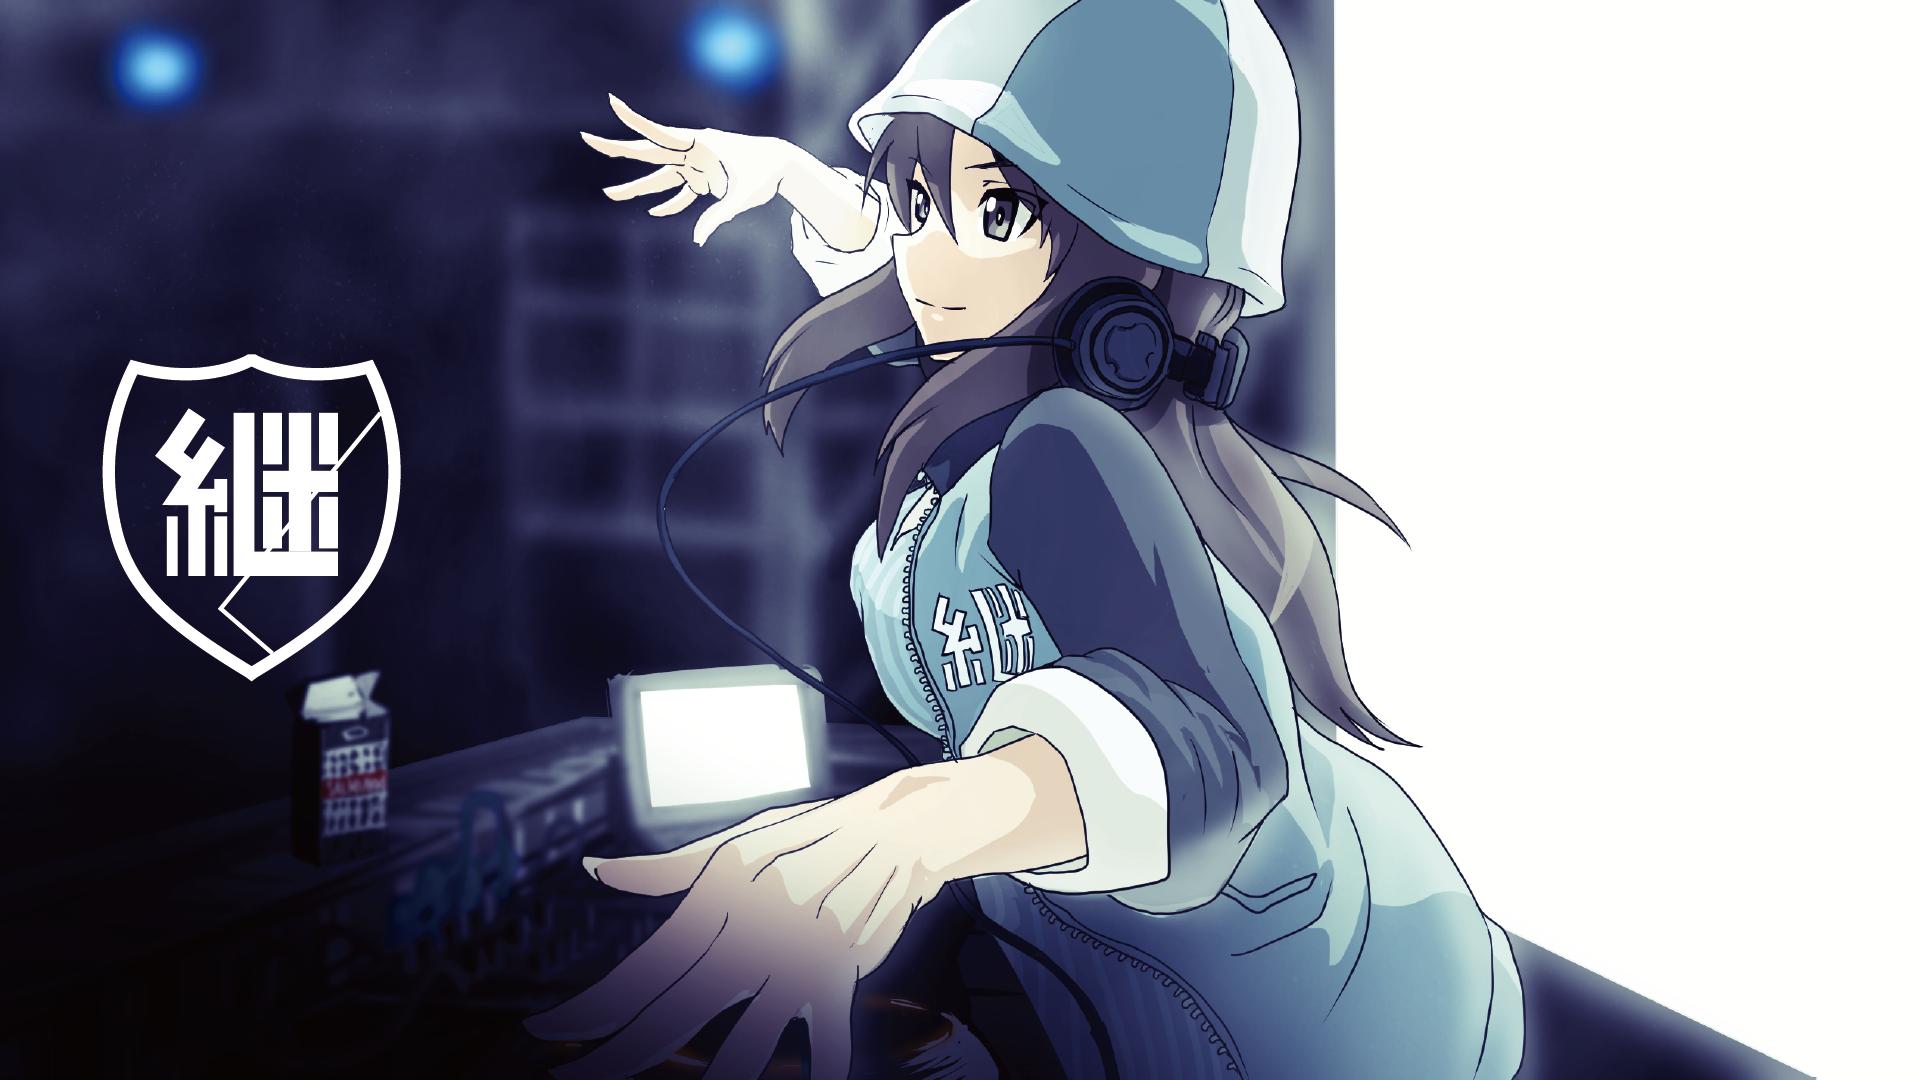 hinh nen anime girl dang yeu 21